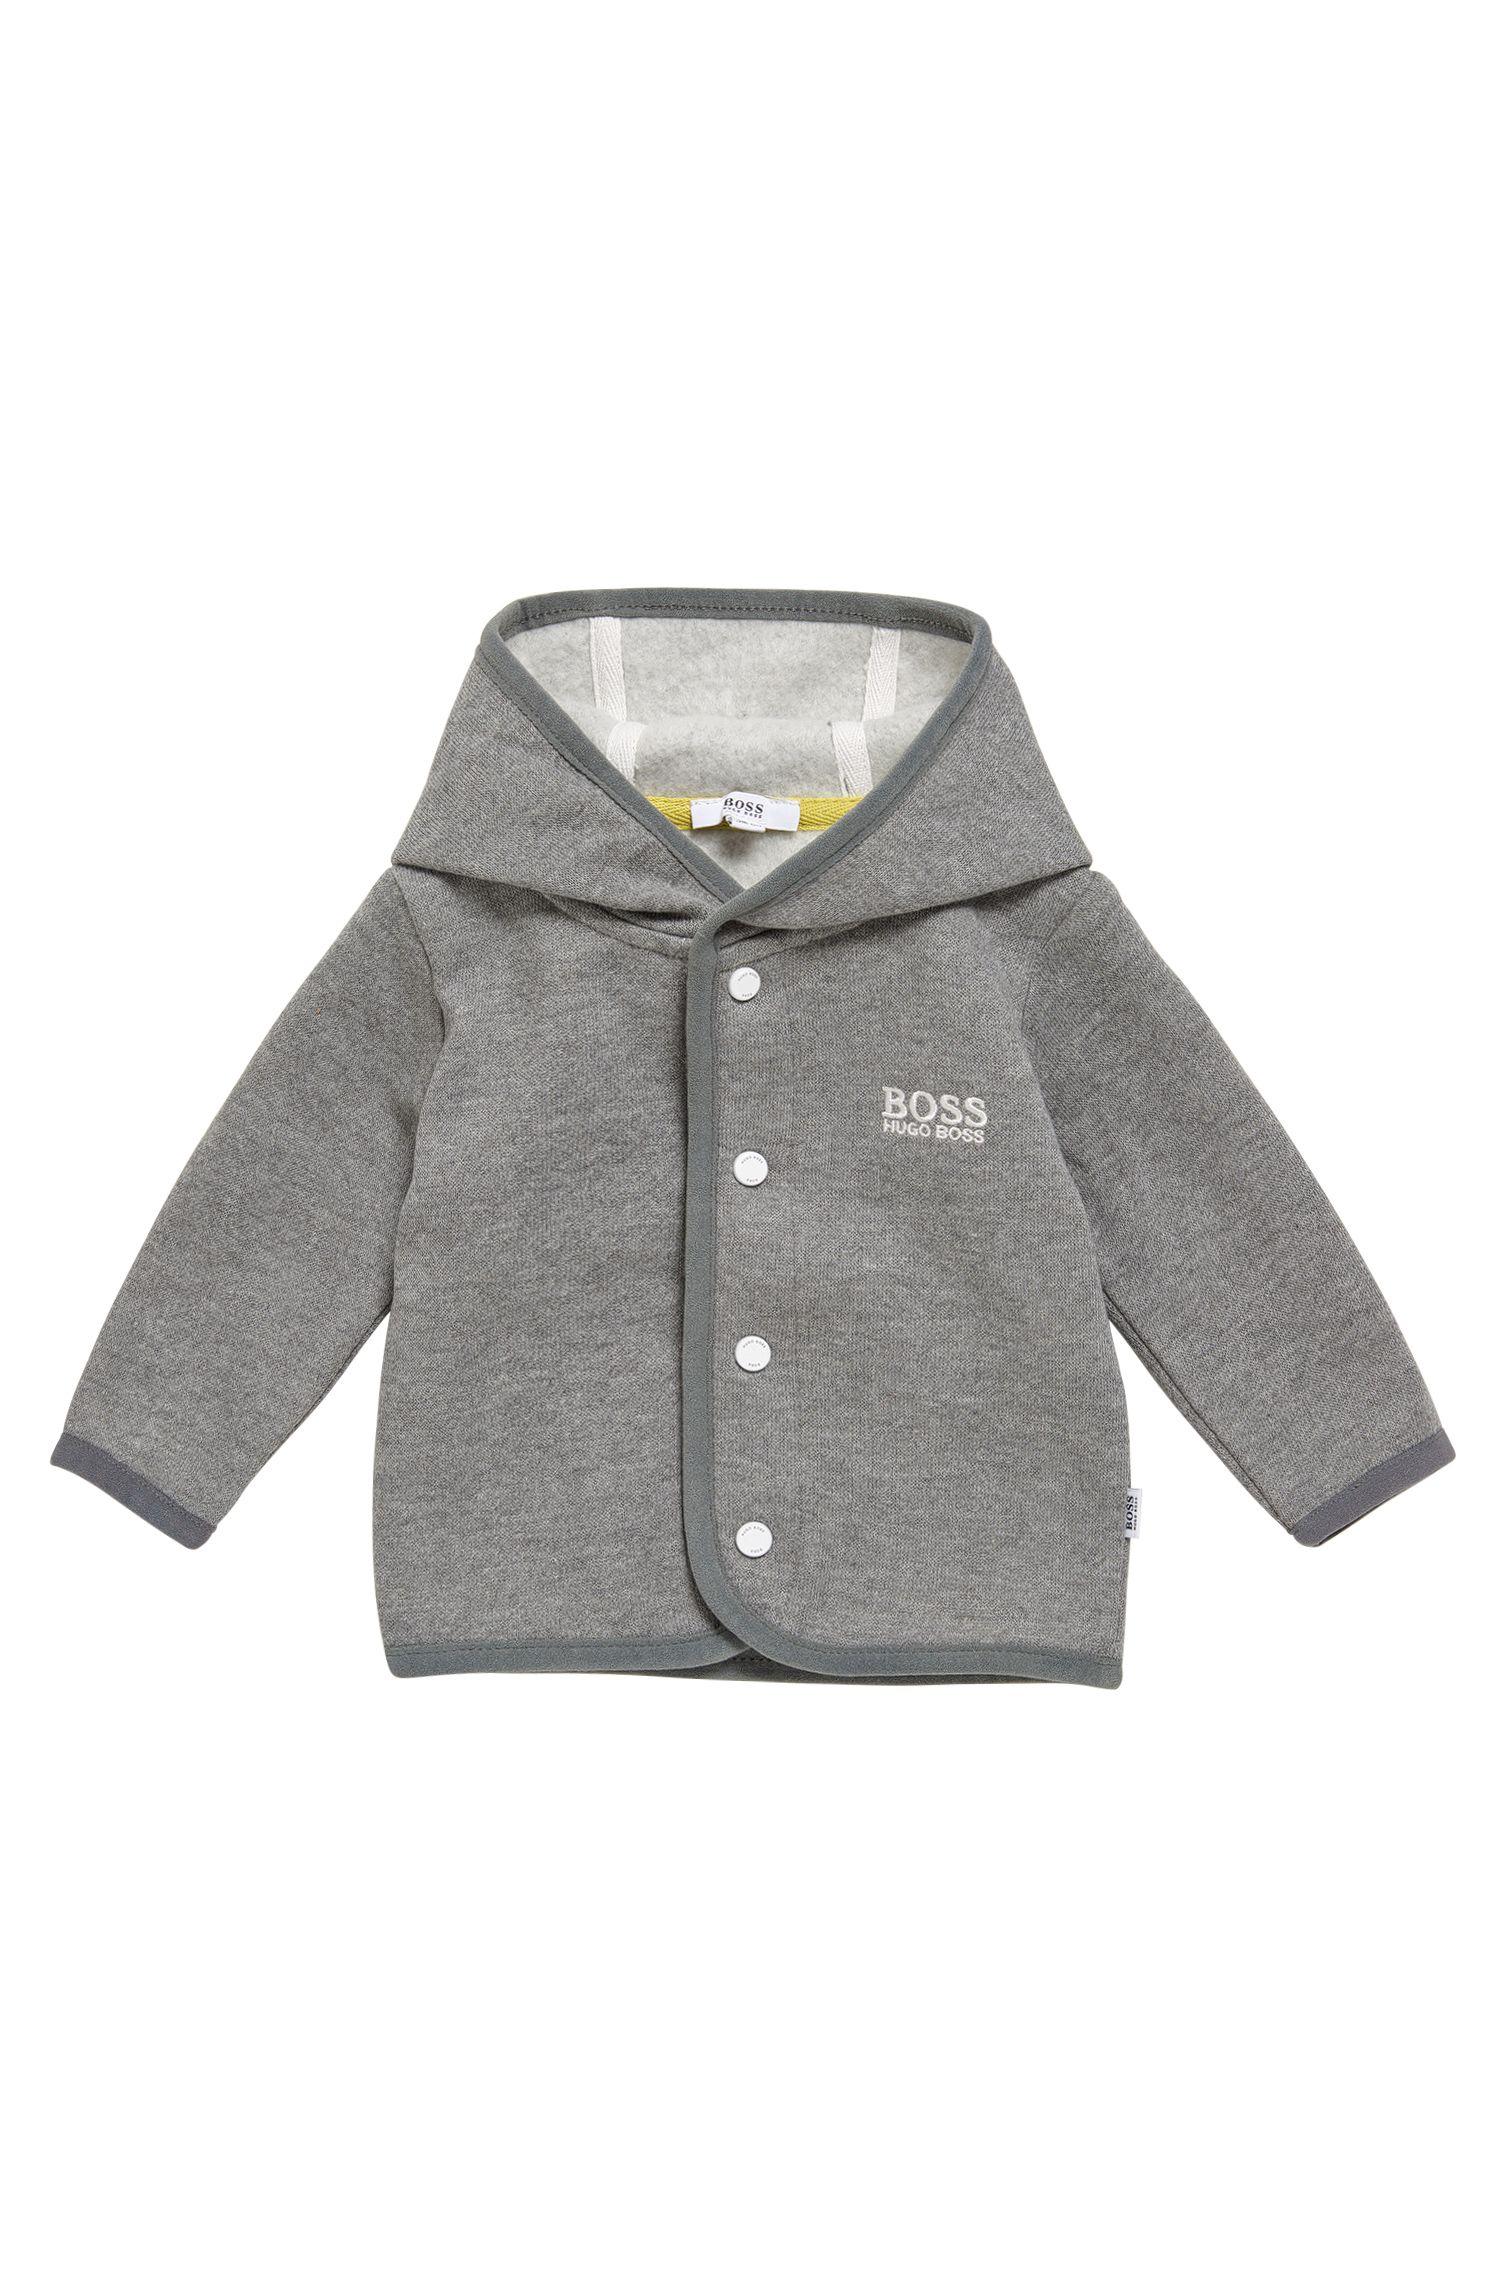 Baby-Sweatjacke aus Baumwoll-Mix mit Kapuze: 'J95212'